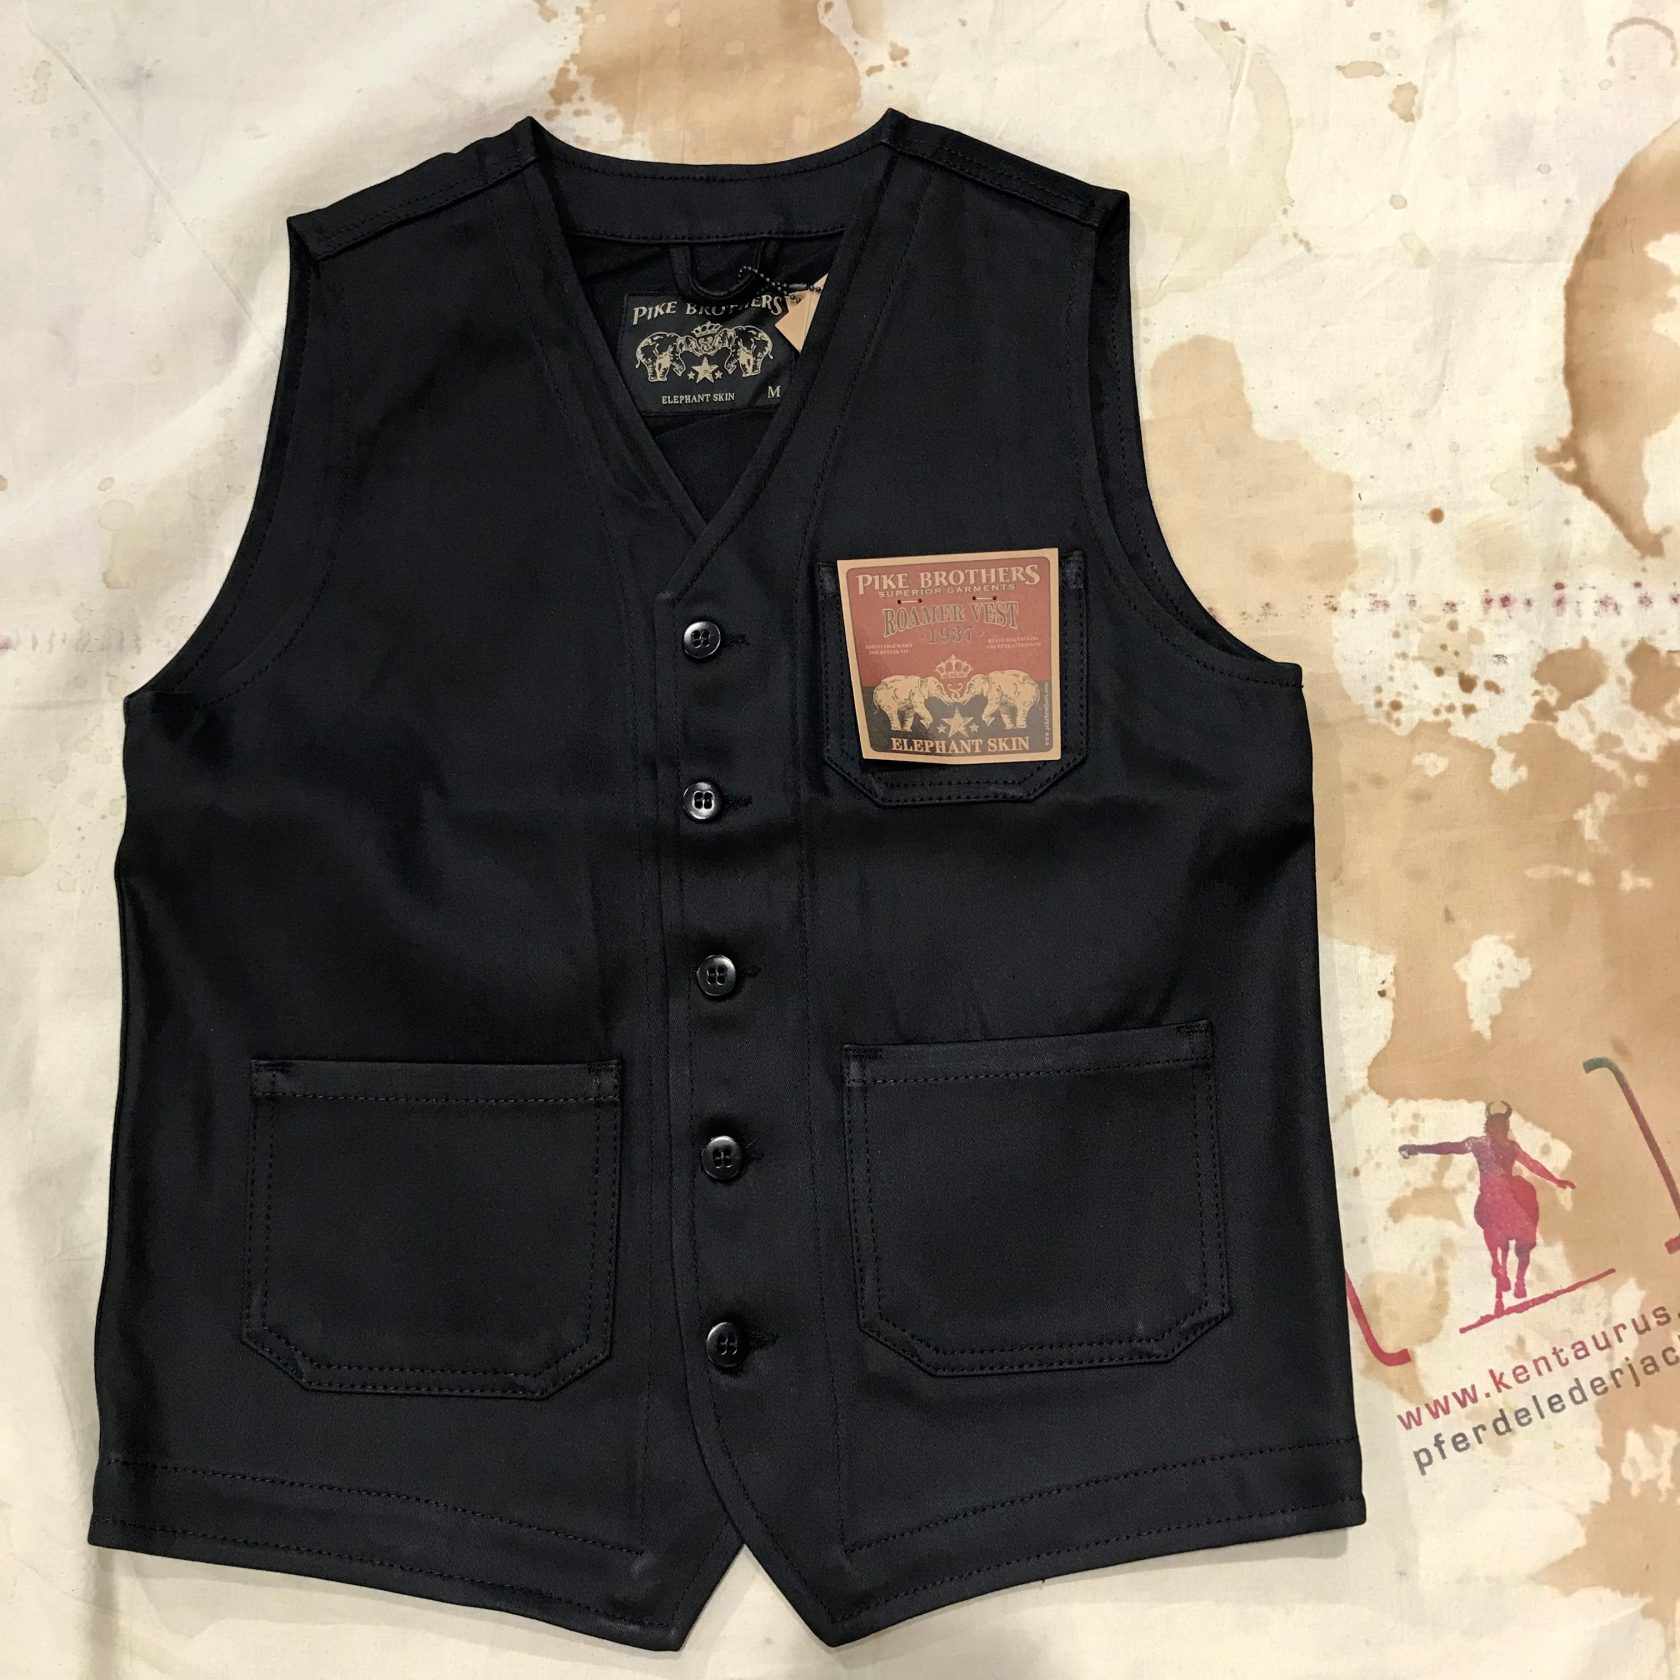 Pike Brothers black elephant skin roamer vest